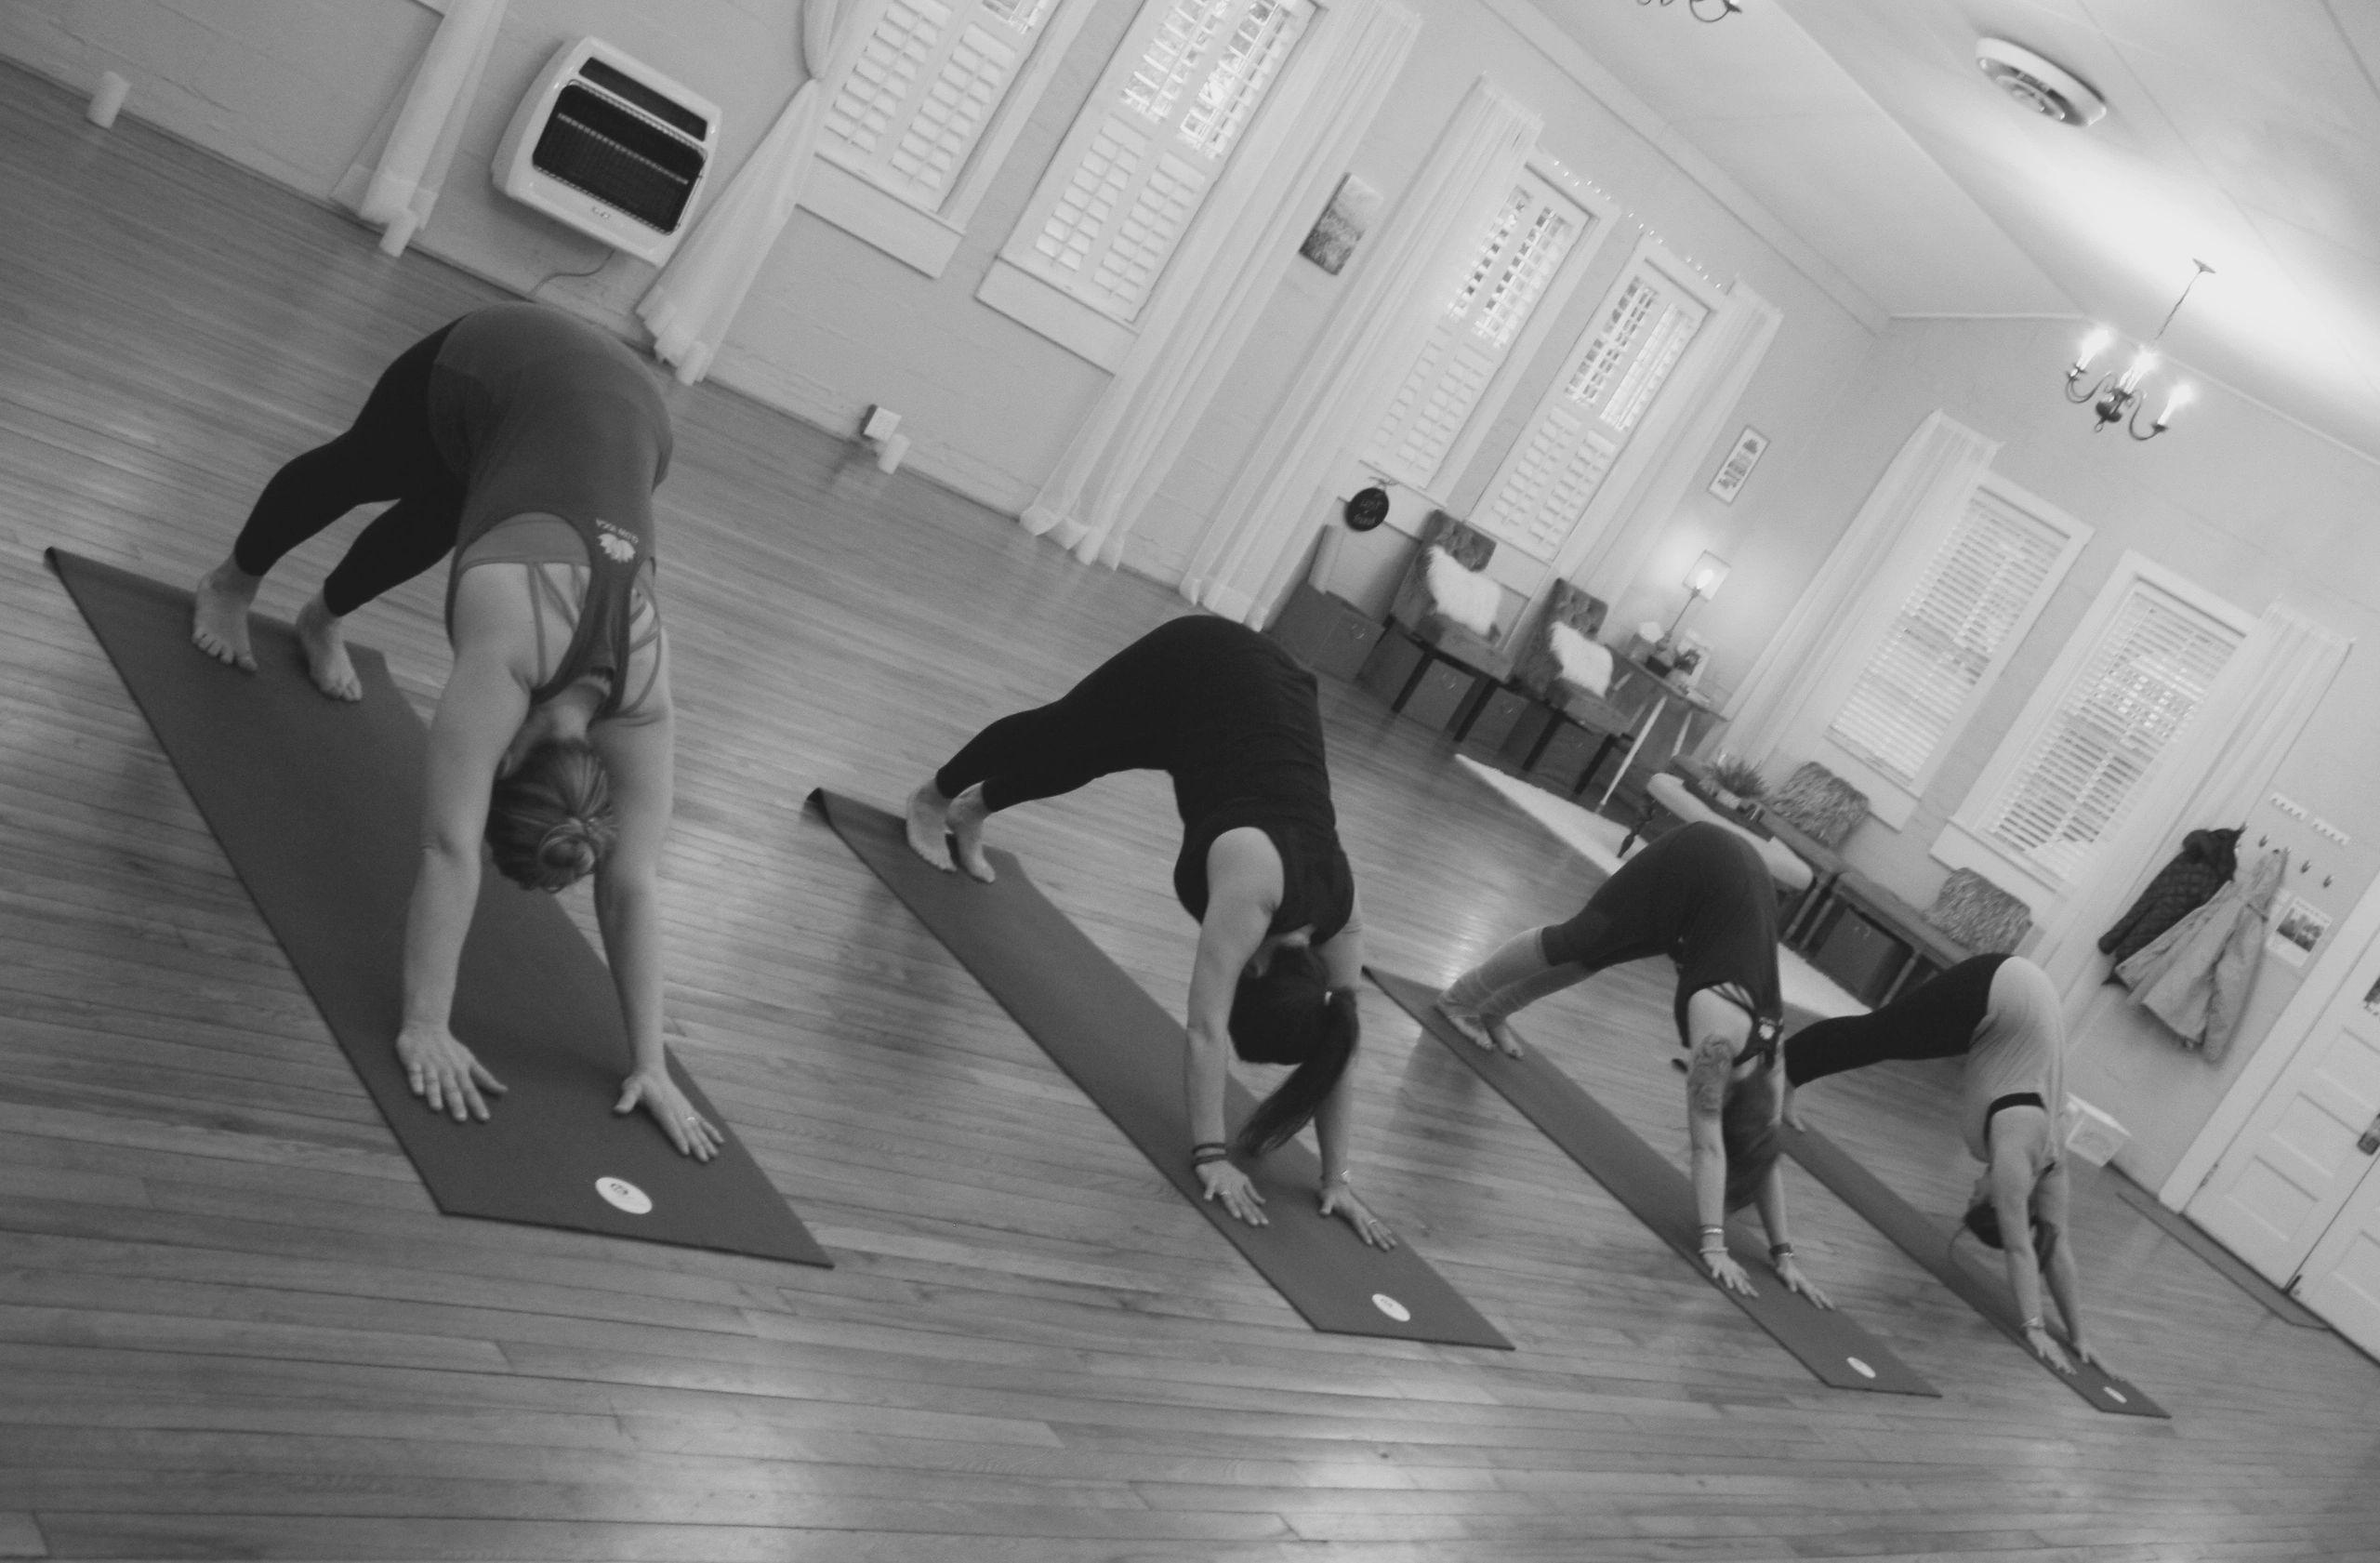 Glow Yoga - Yoga, Yoga, Restorative Yoga, Meditation ...